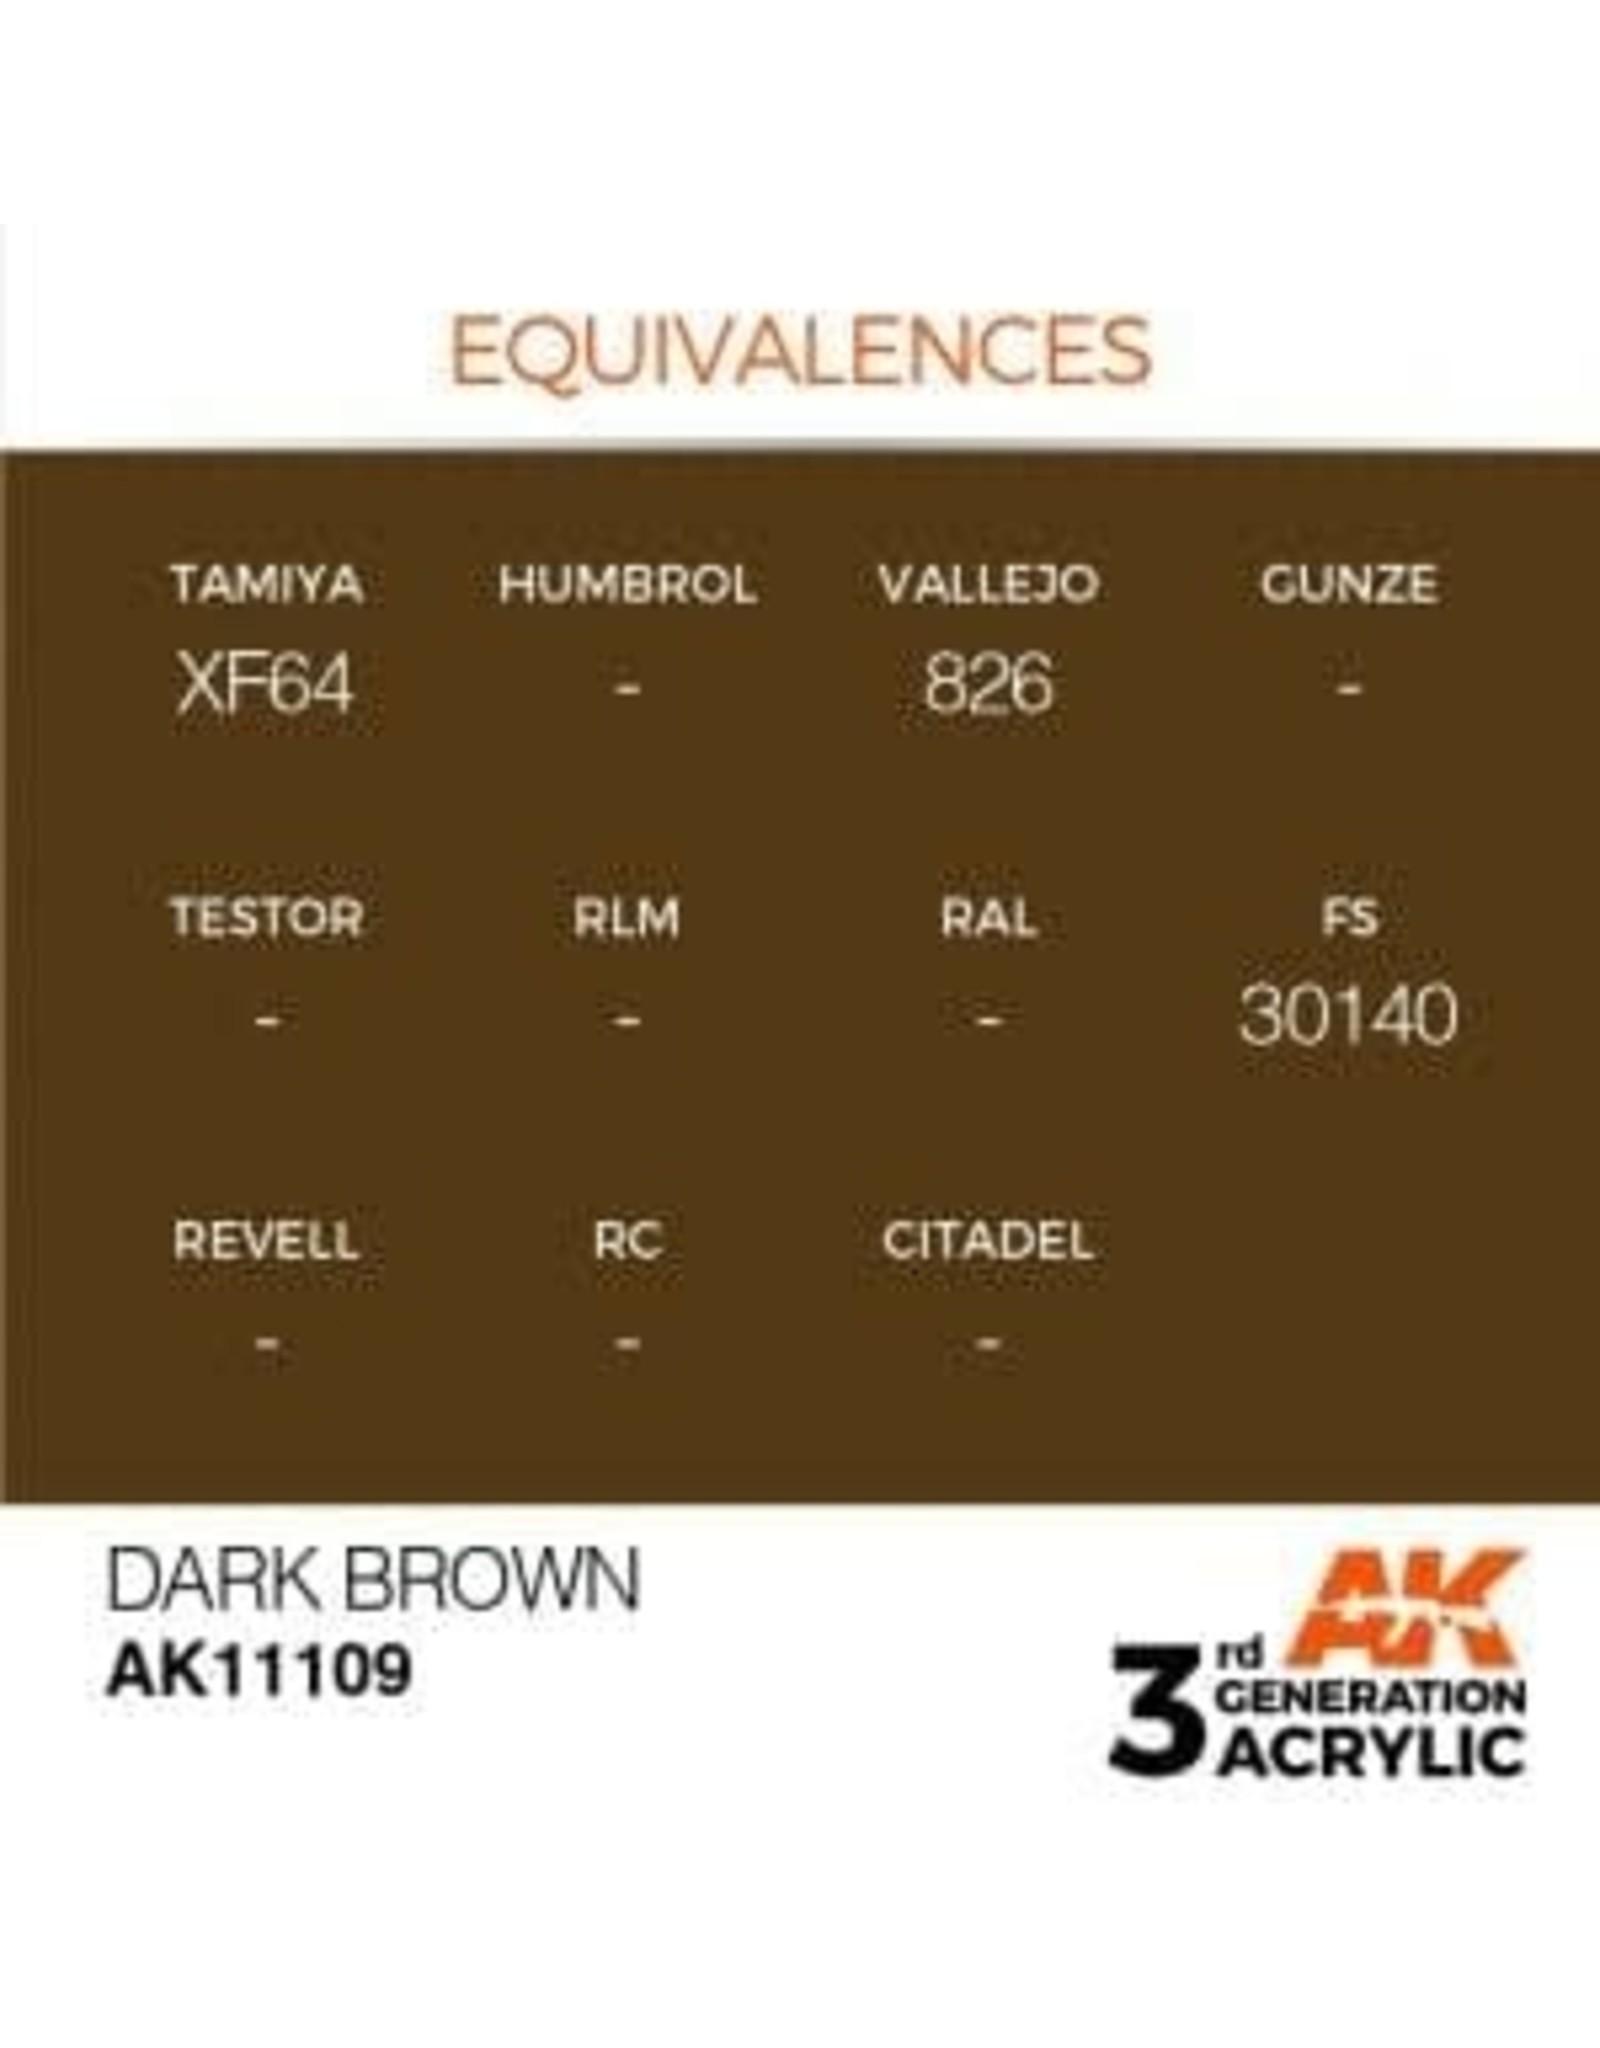 AK Interactive 3RD GEN ACRYLIC DARK BROWN 17ML